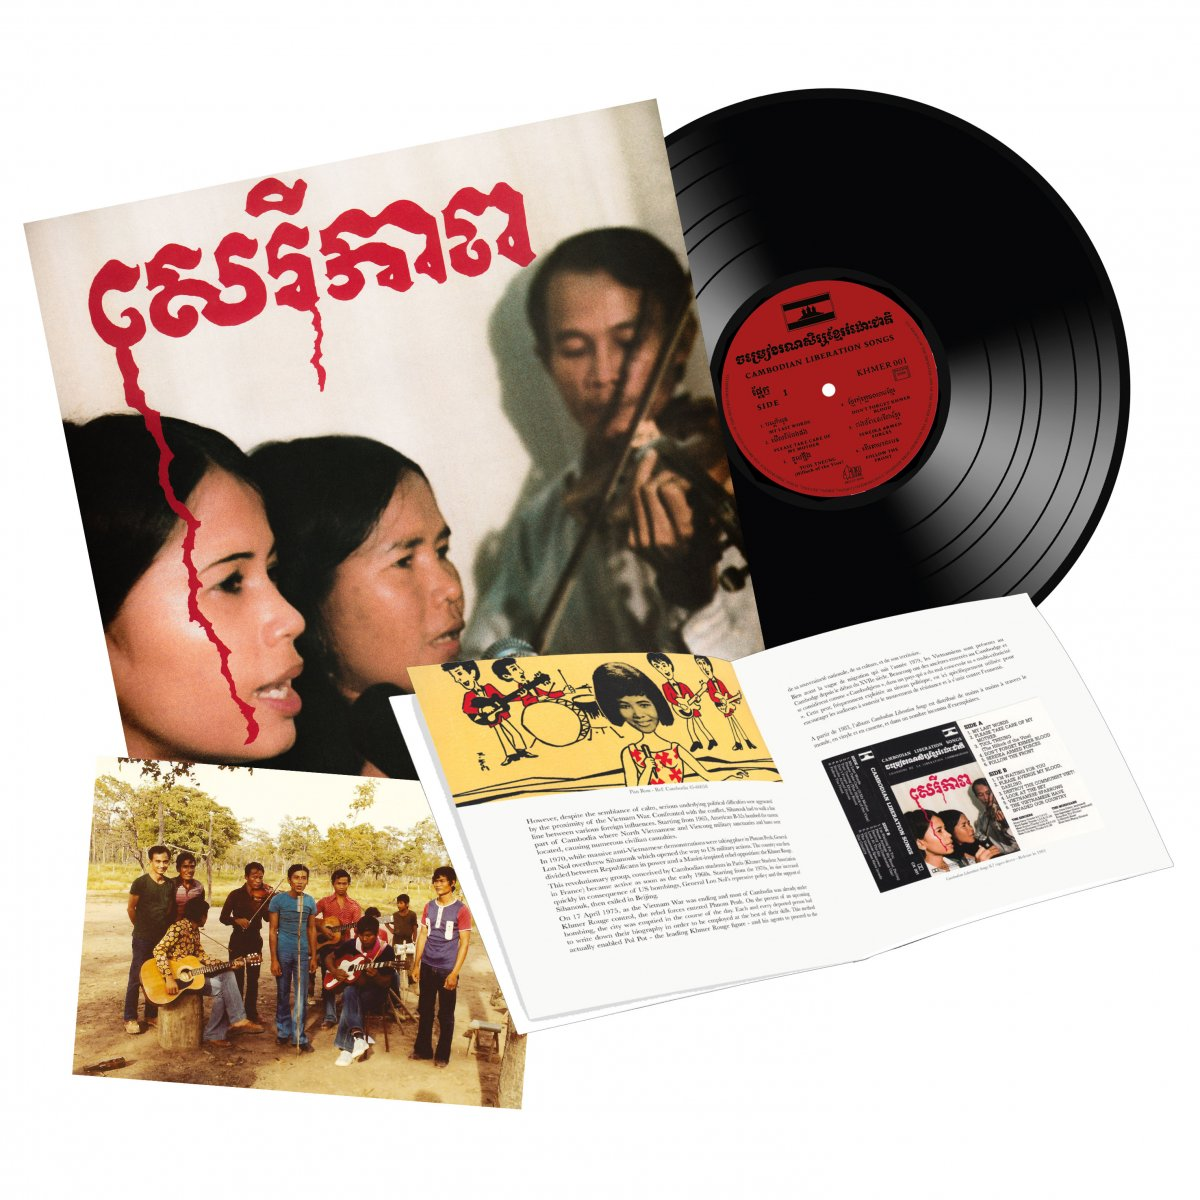 Cambodian Liberation Songs (Banteay Ampil Band) - Akuphone